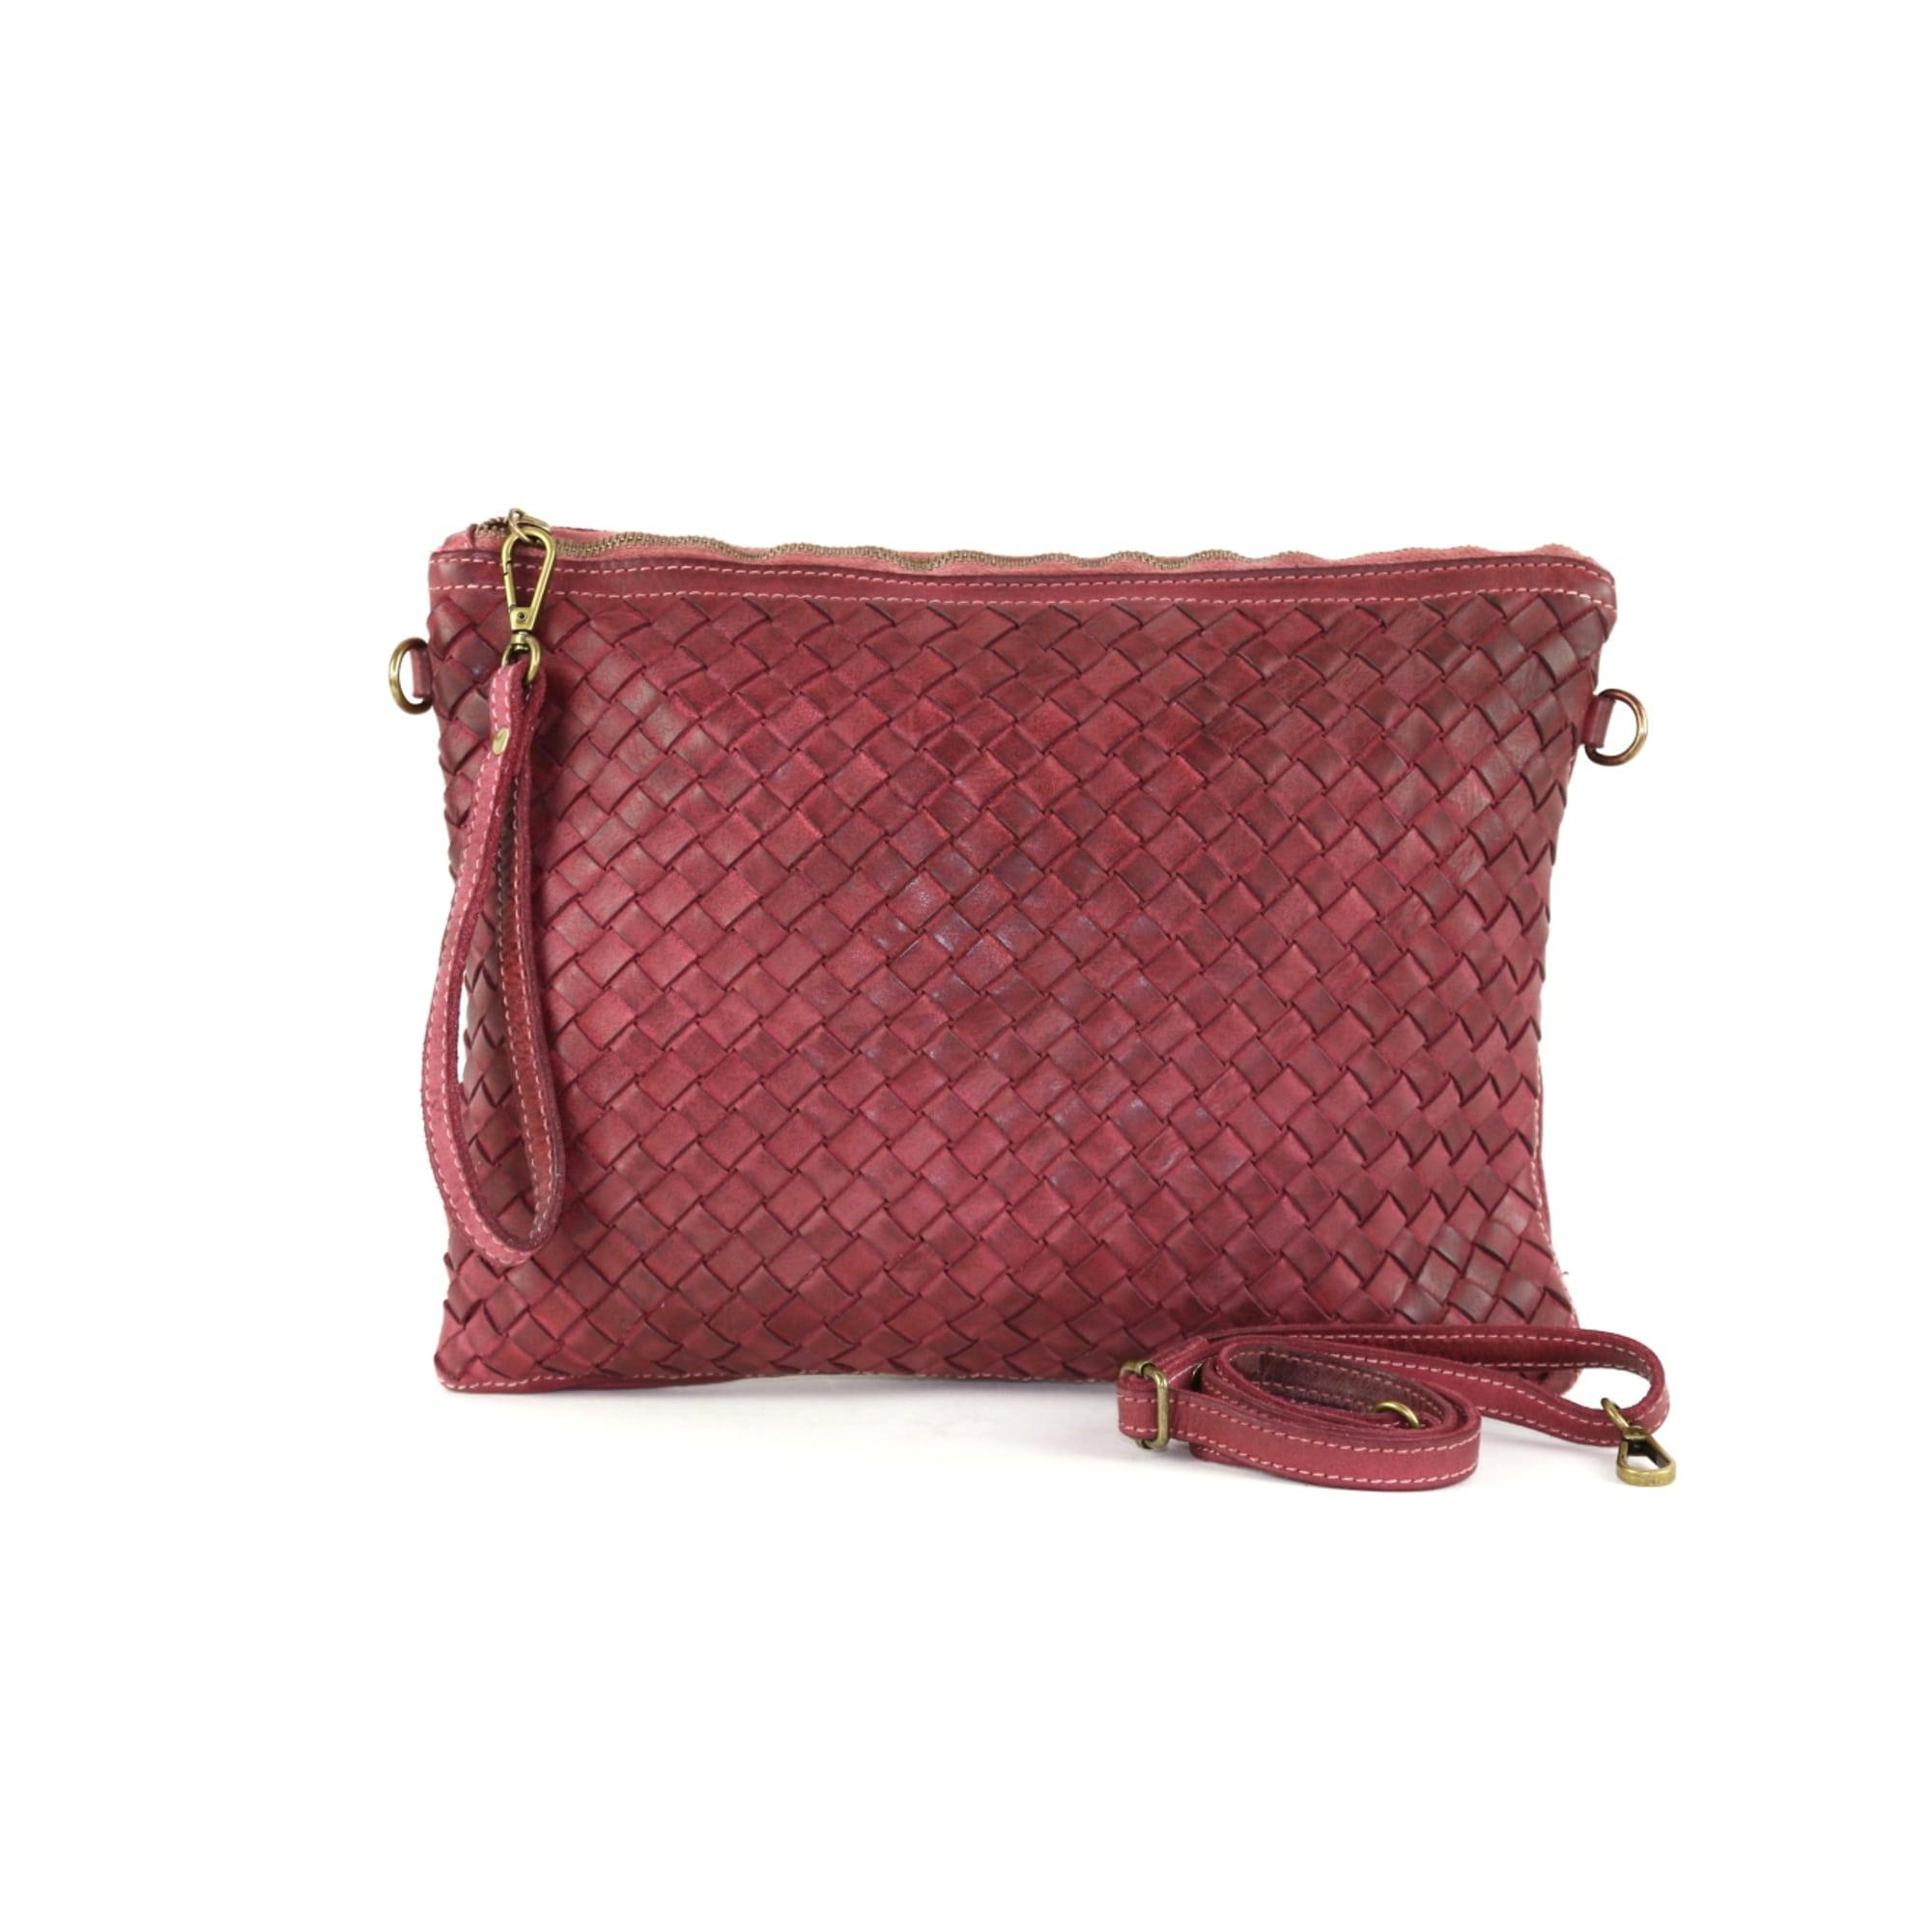 Lederhandtasche MADE IN ITALIE Rot, bordeauxrot